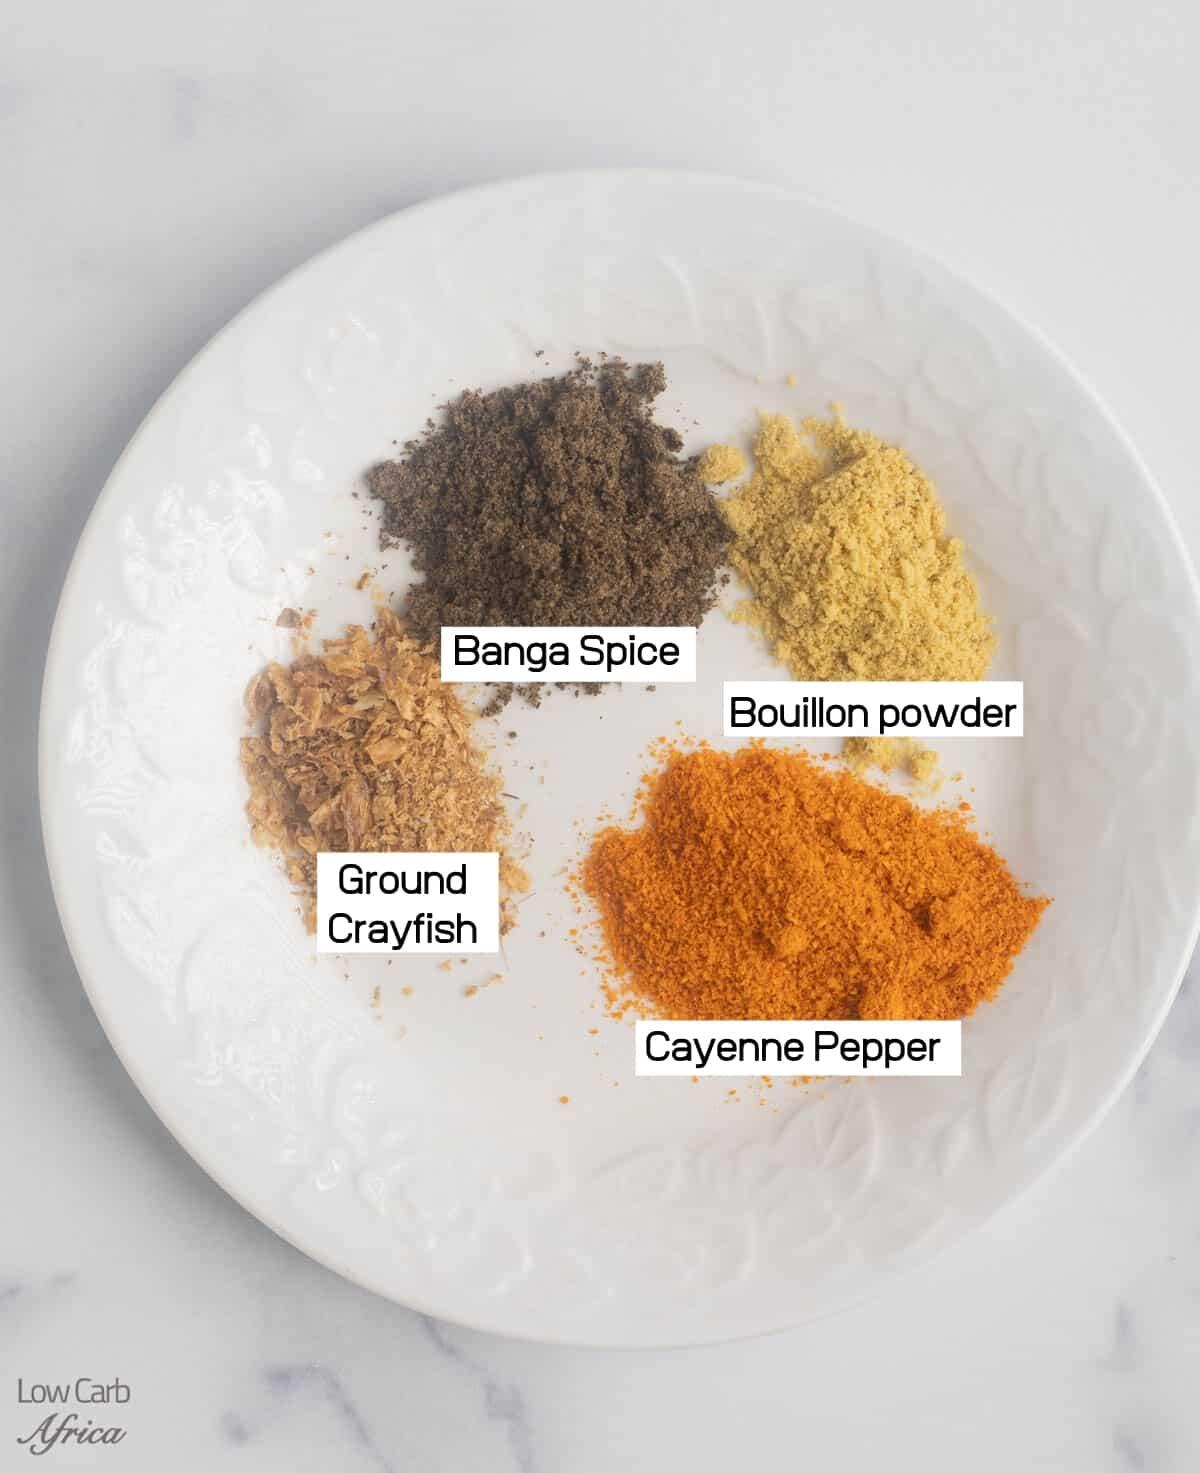 banga spice, cayenne pepper, ground crayfish